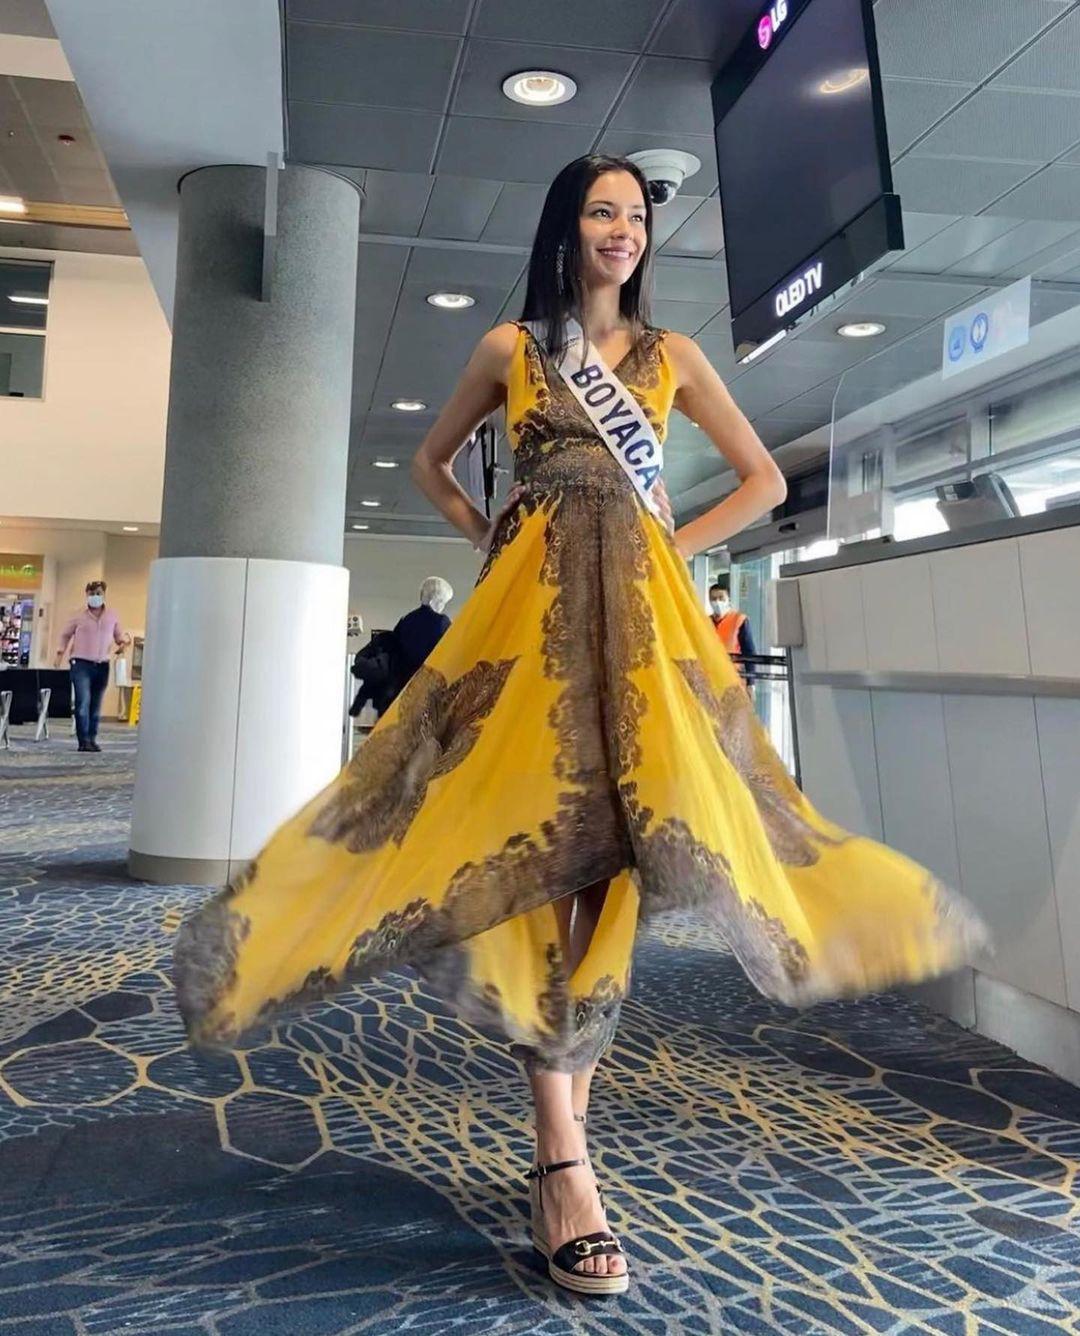 candidatas a miss universe colombia 2021. final: 18 oct. sede: neiva. - Página 5 52SkuV